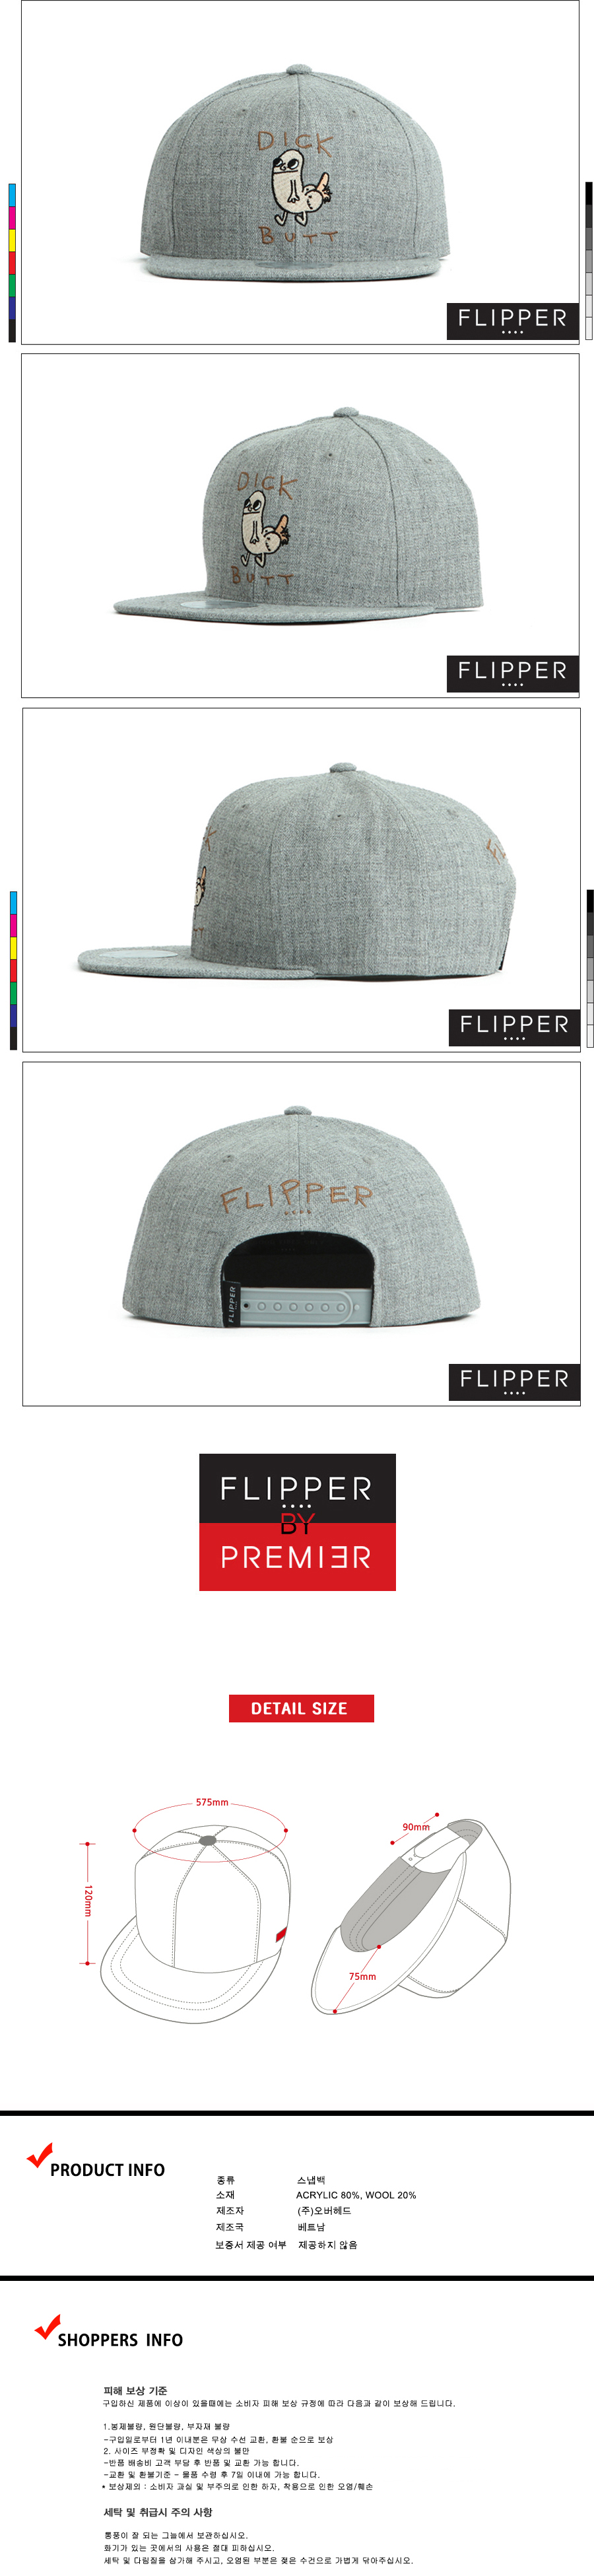 [ PREMIER ] [Premier] Flipper Snapback Dick And Butt Grey (FL012)